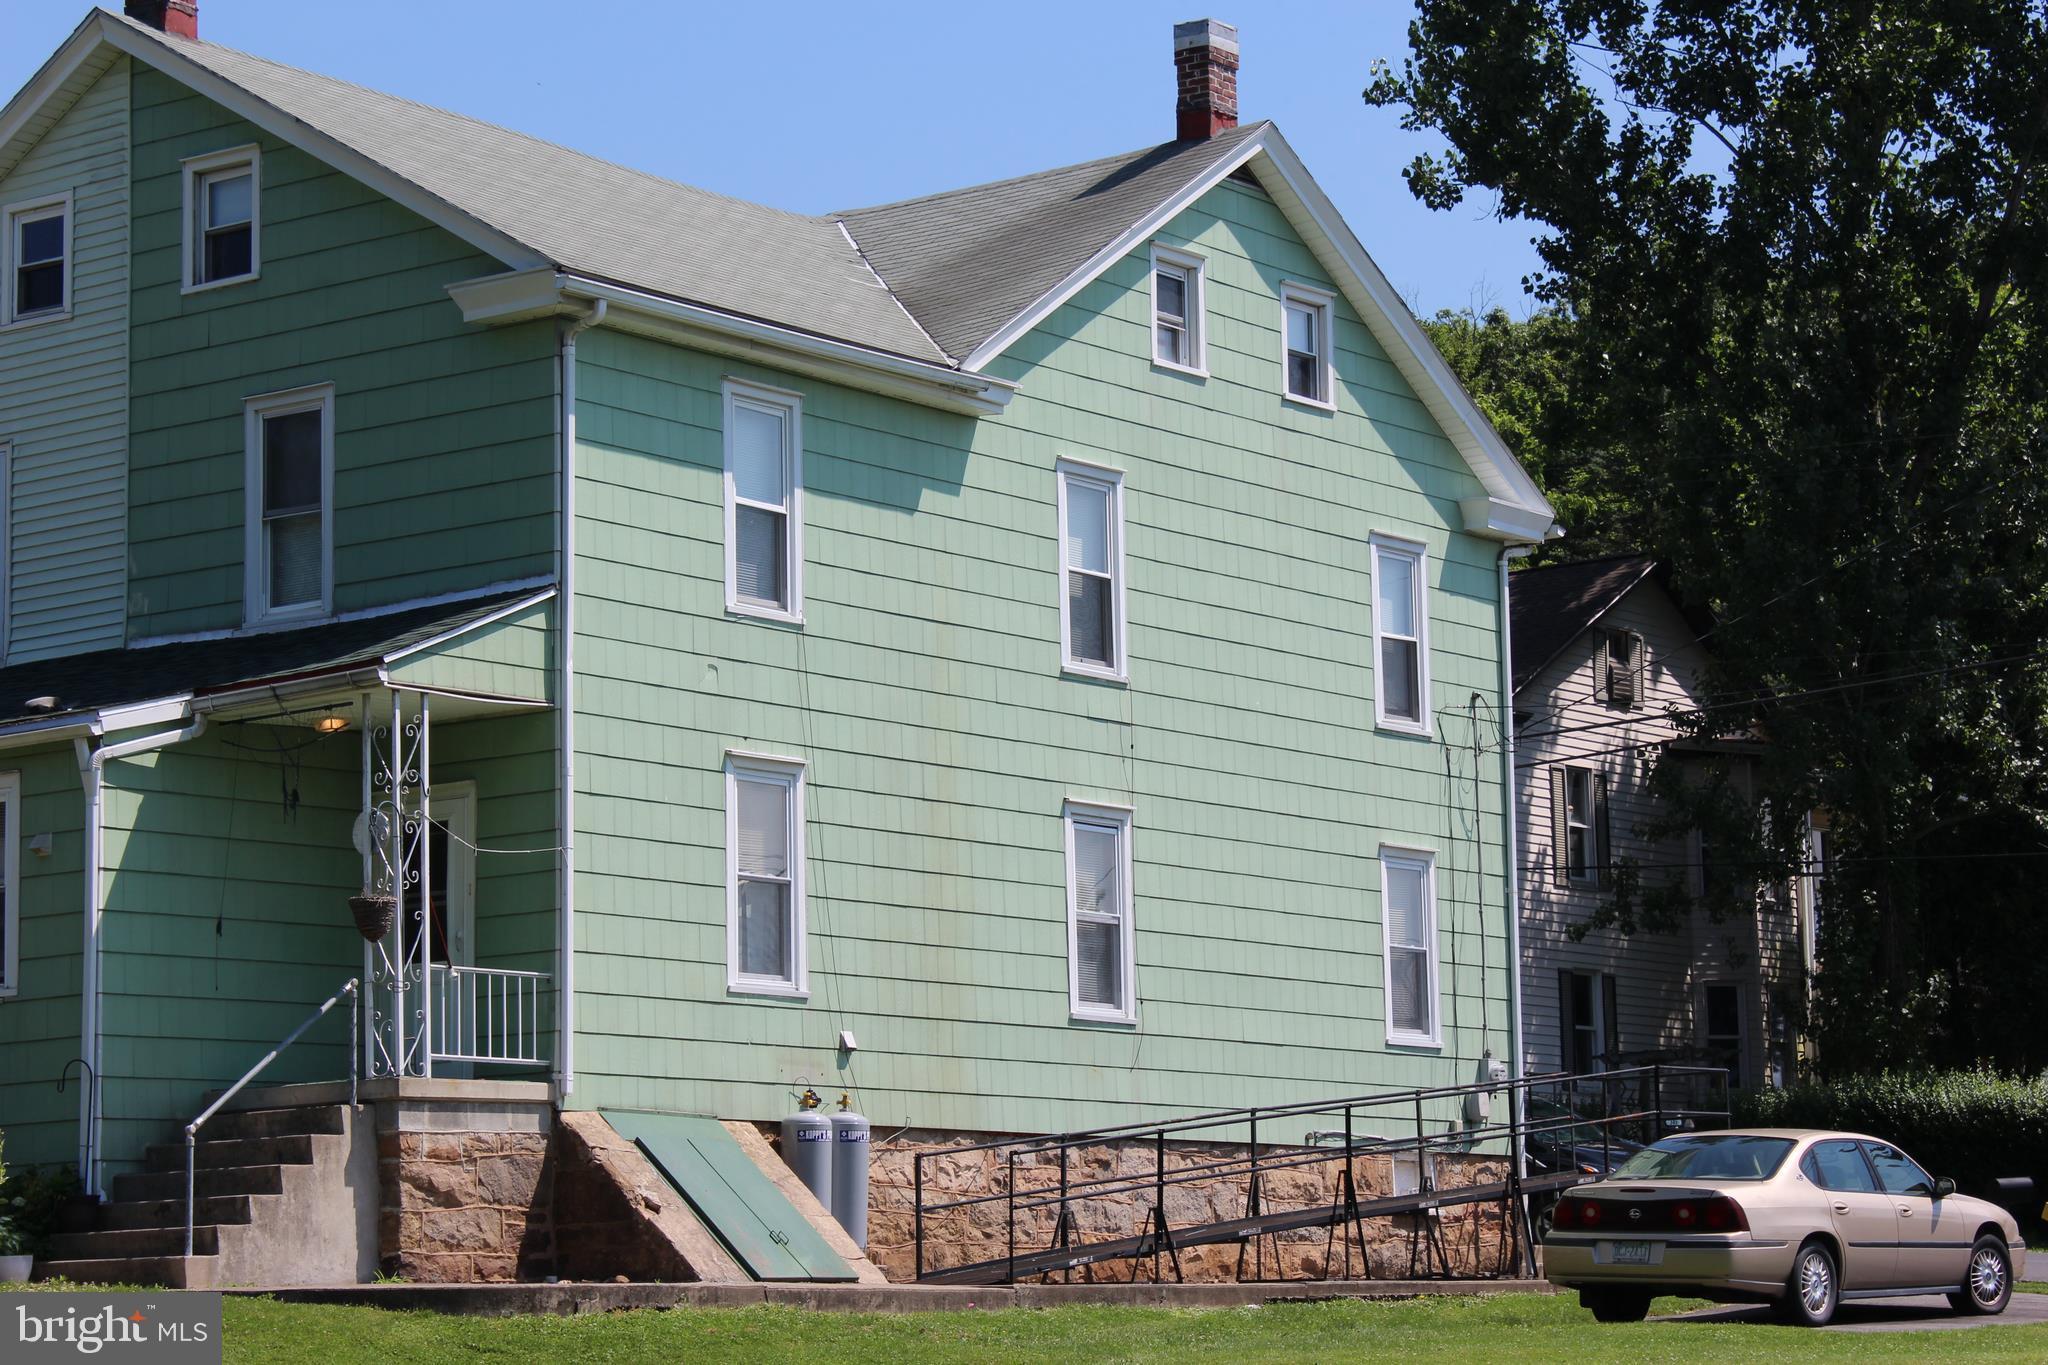 304 N KEYSTONE STREET, MUIR, PA 17957